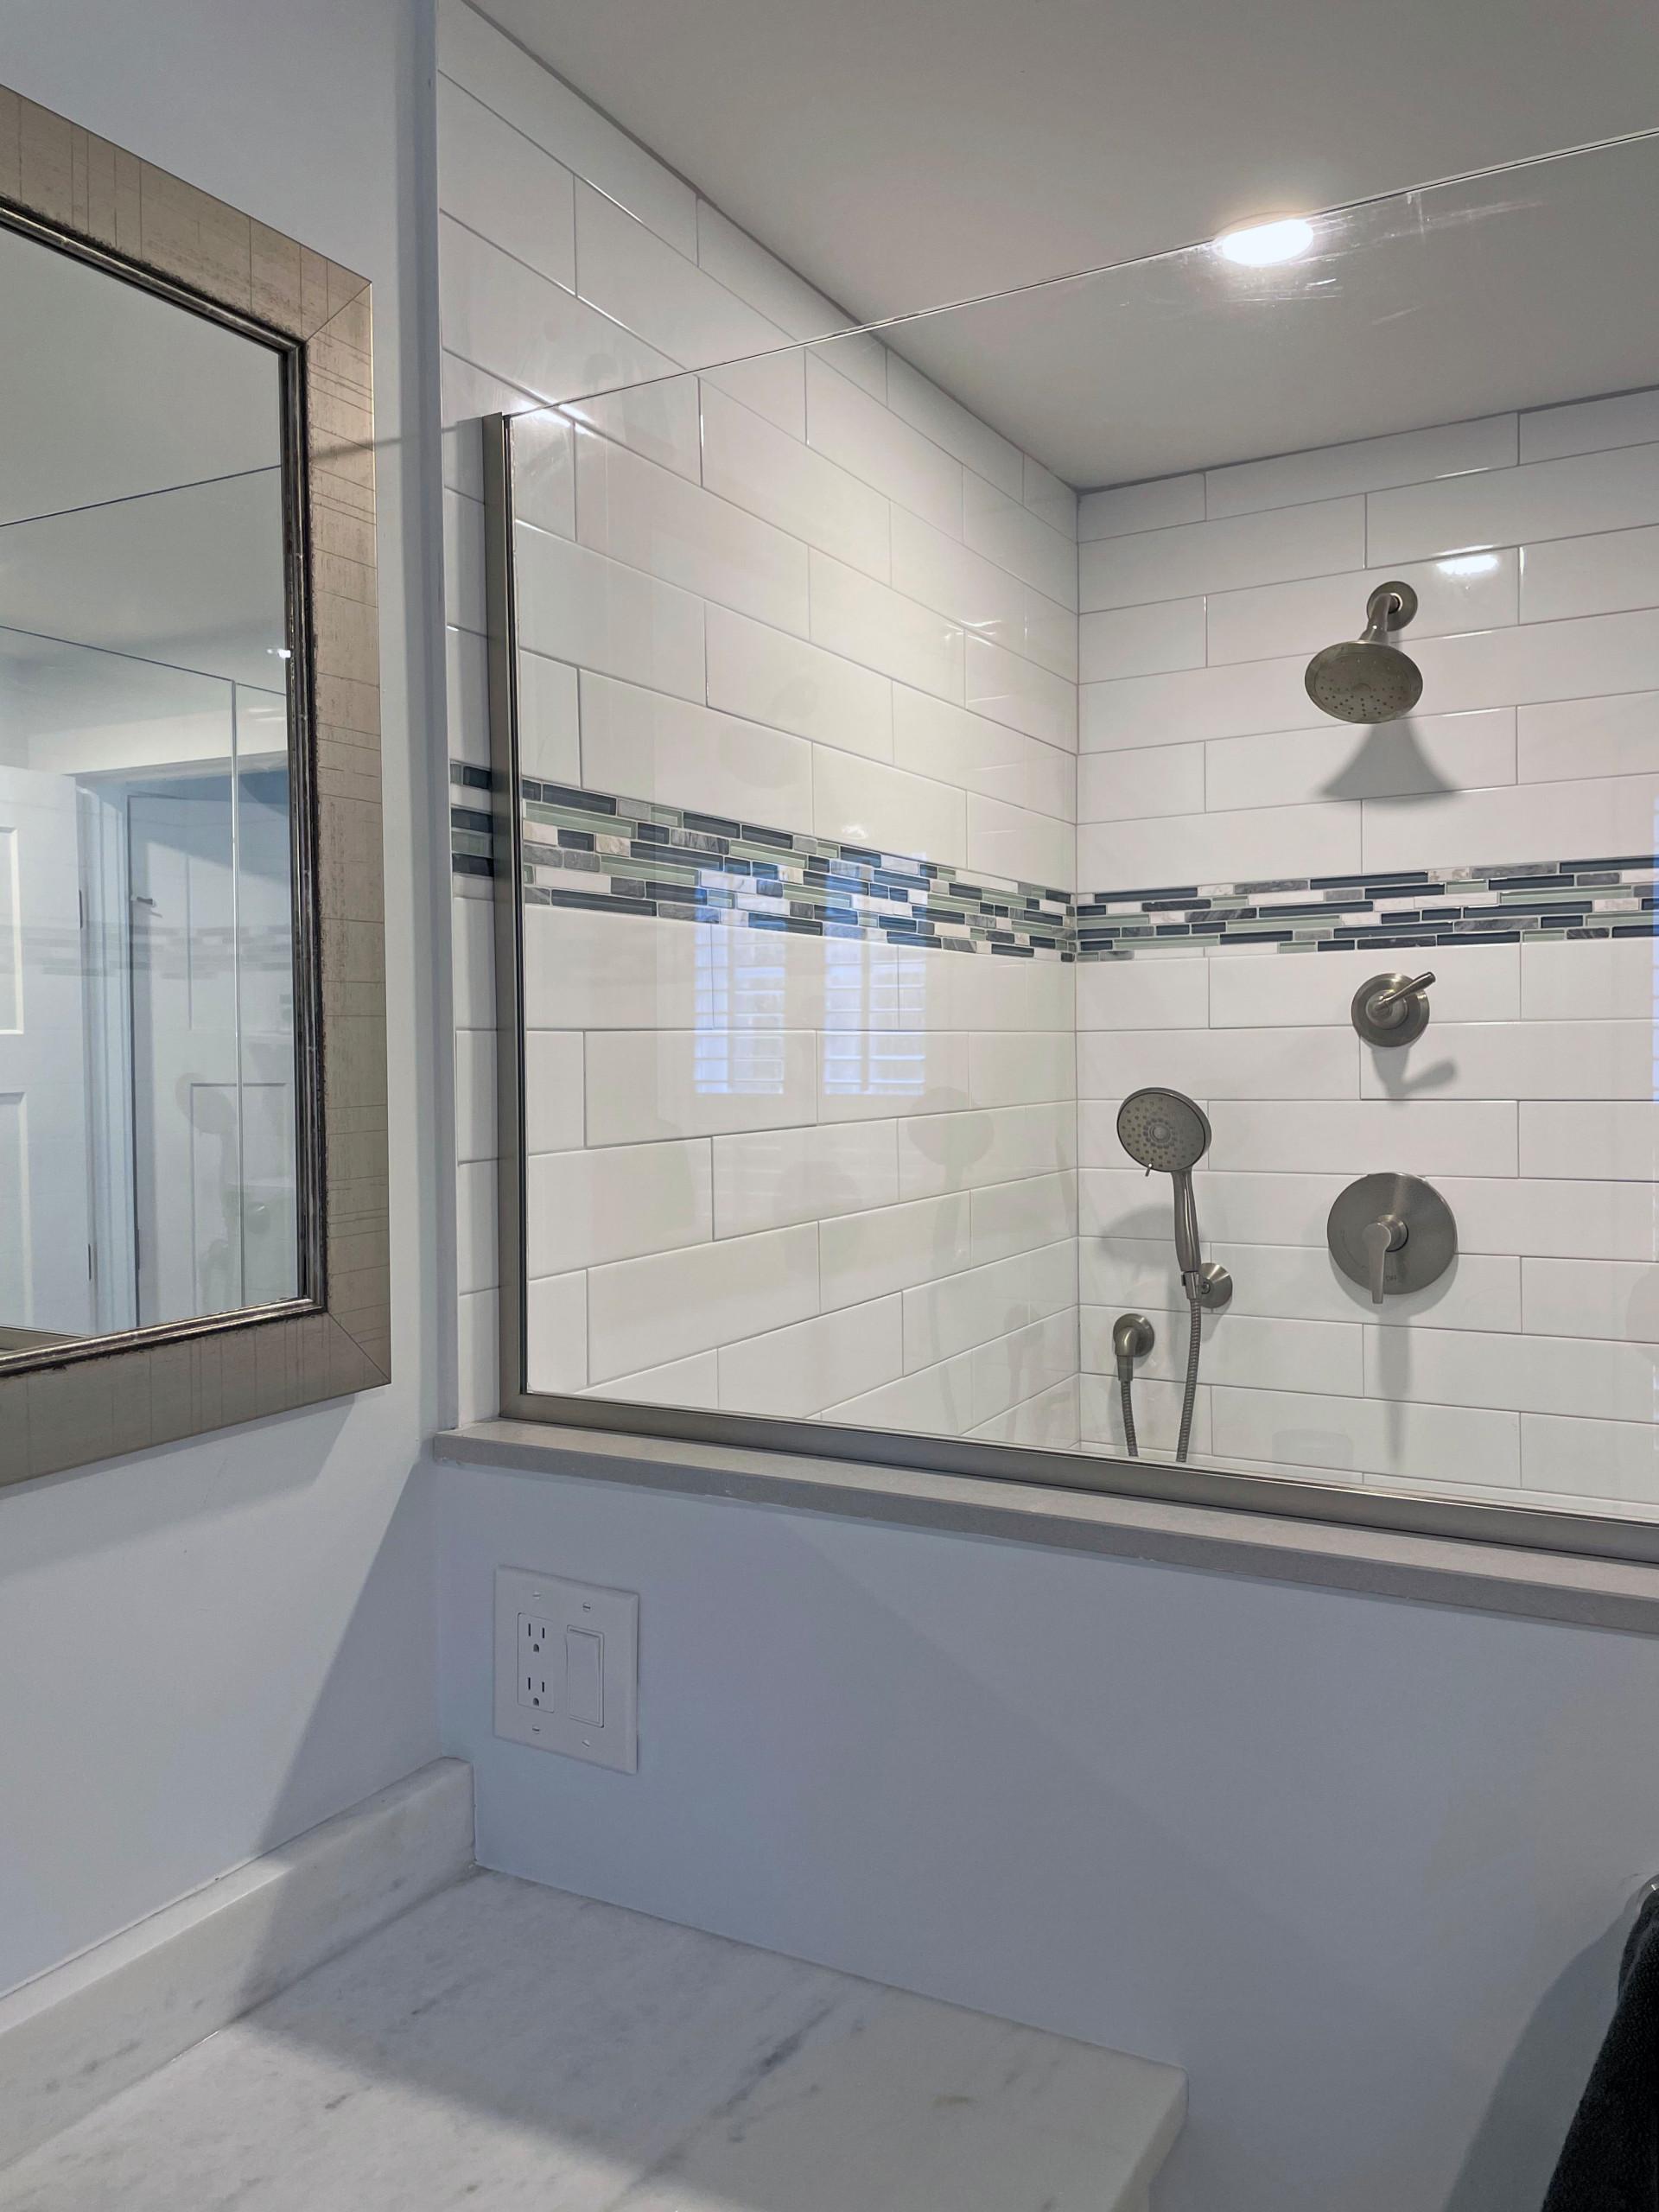 In law shower in main bathroom